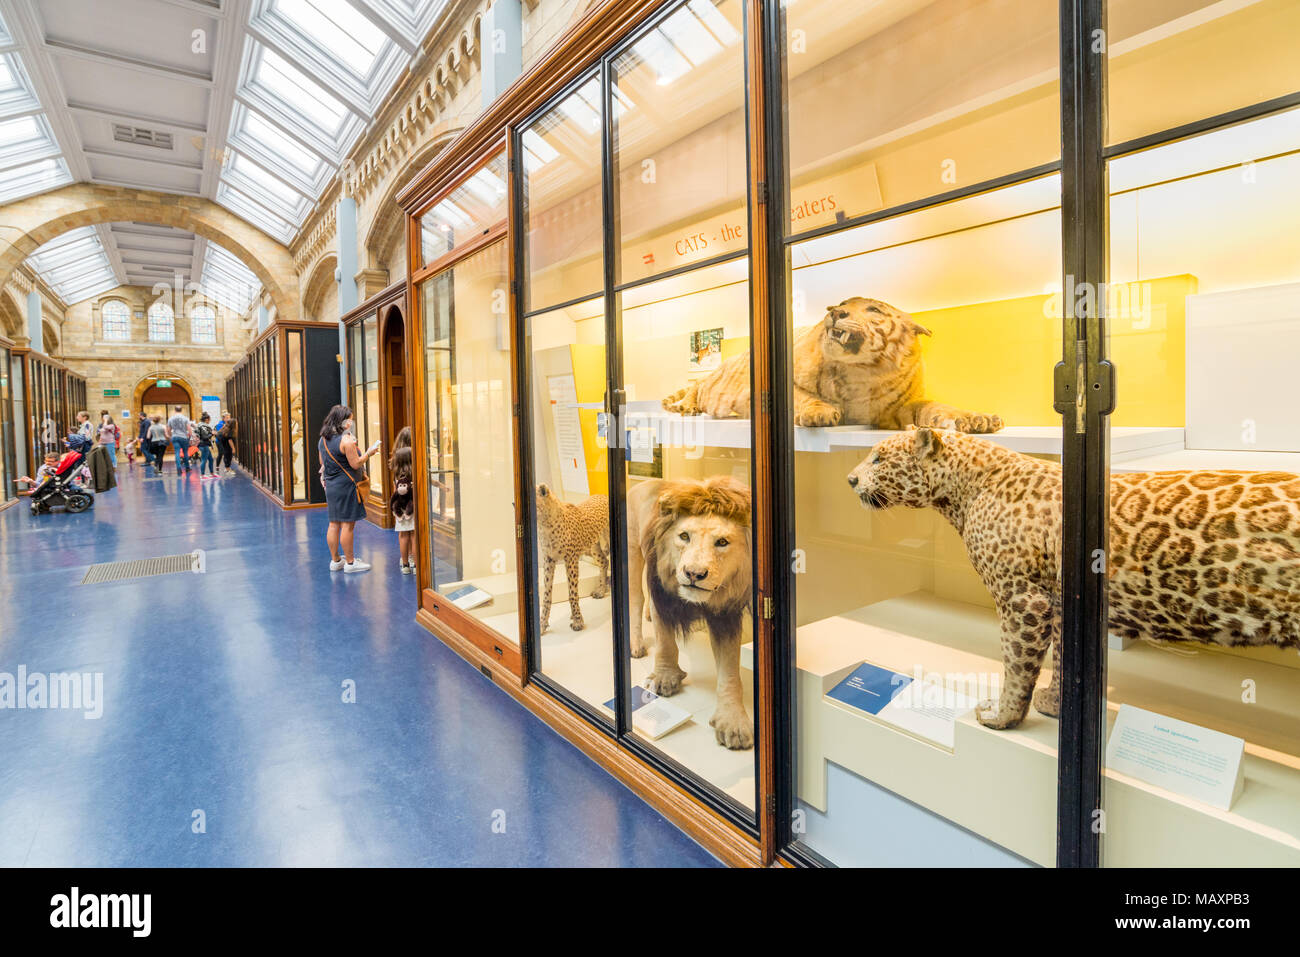 Stuffed big cats at the Natural History Museum, London, UK - Stock Image